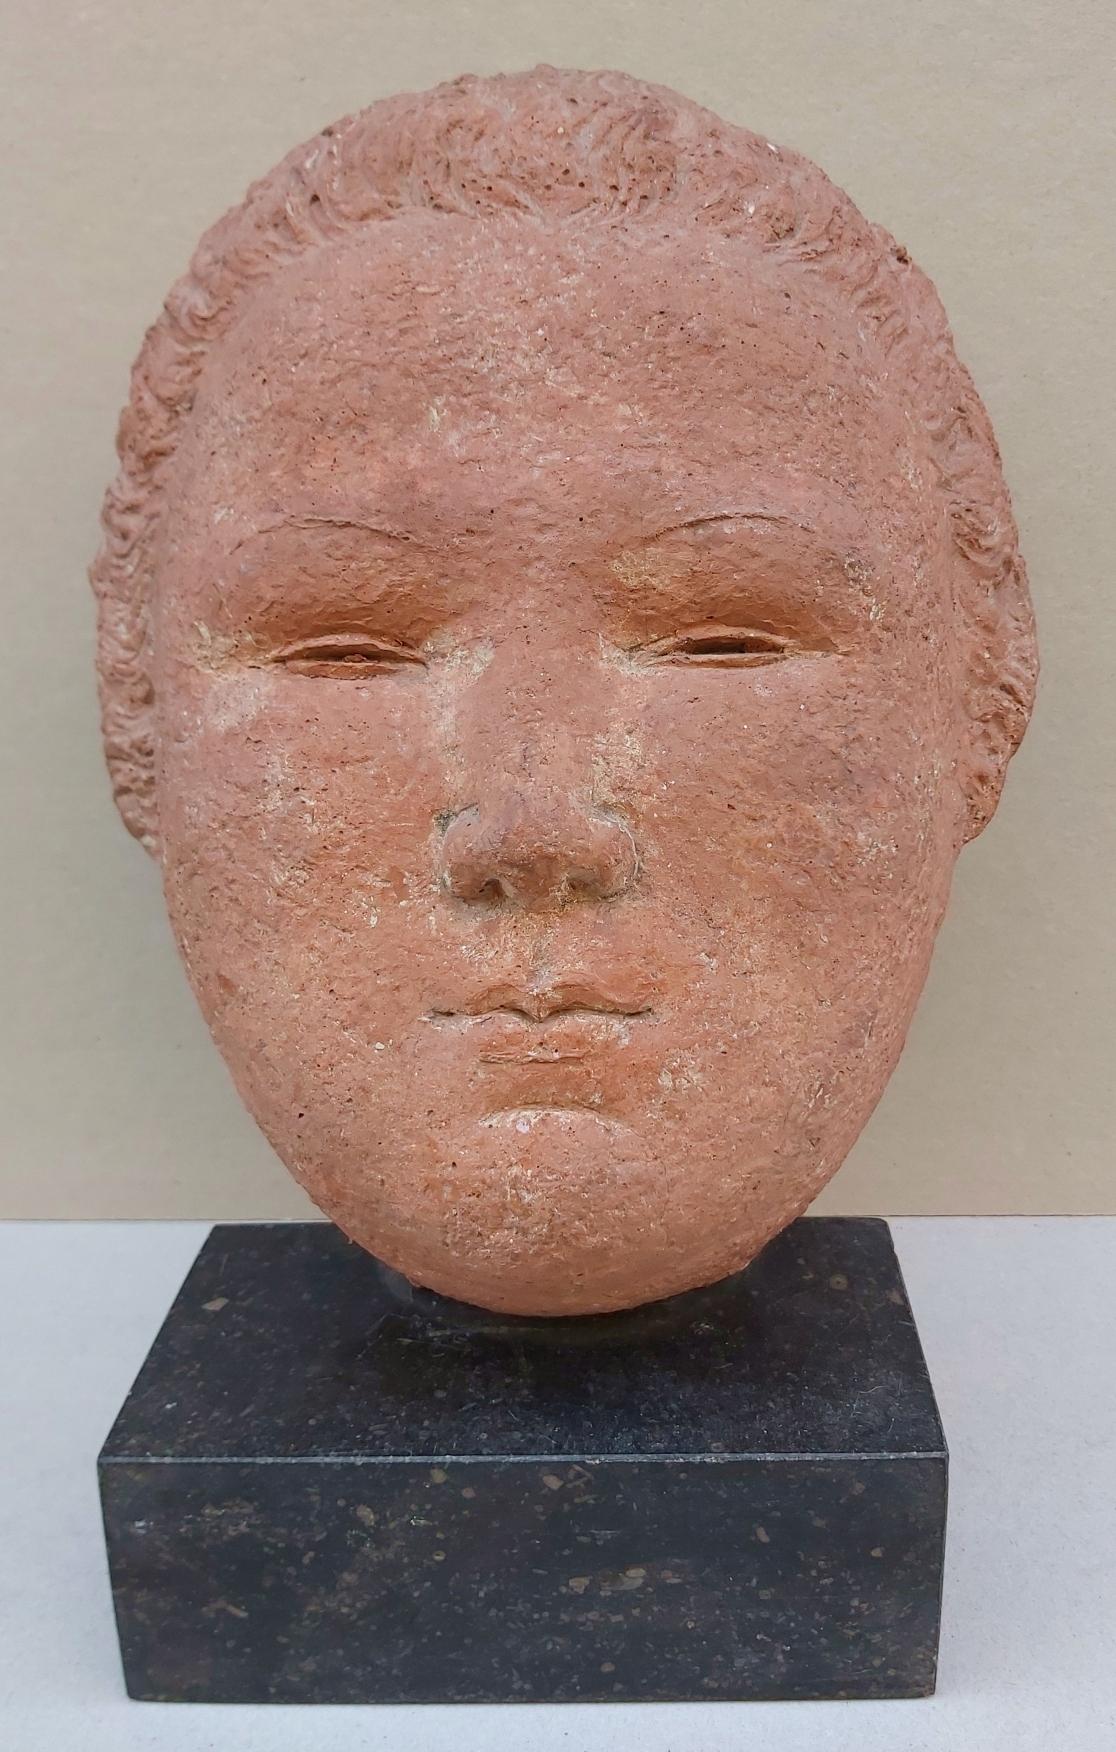 Яніна Райхерт-Тот. Китайська маска, 1957